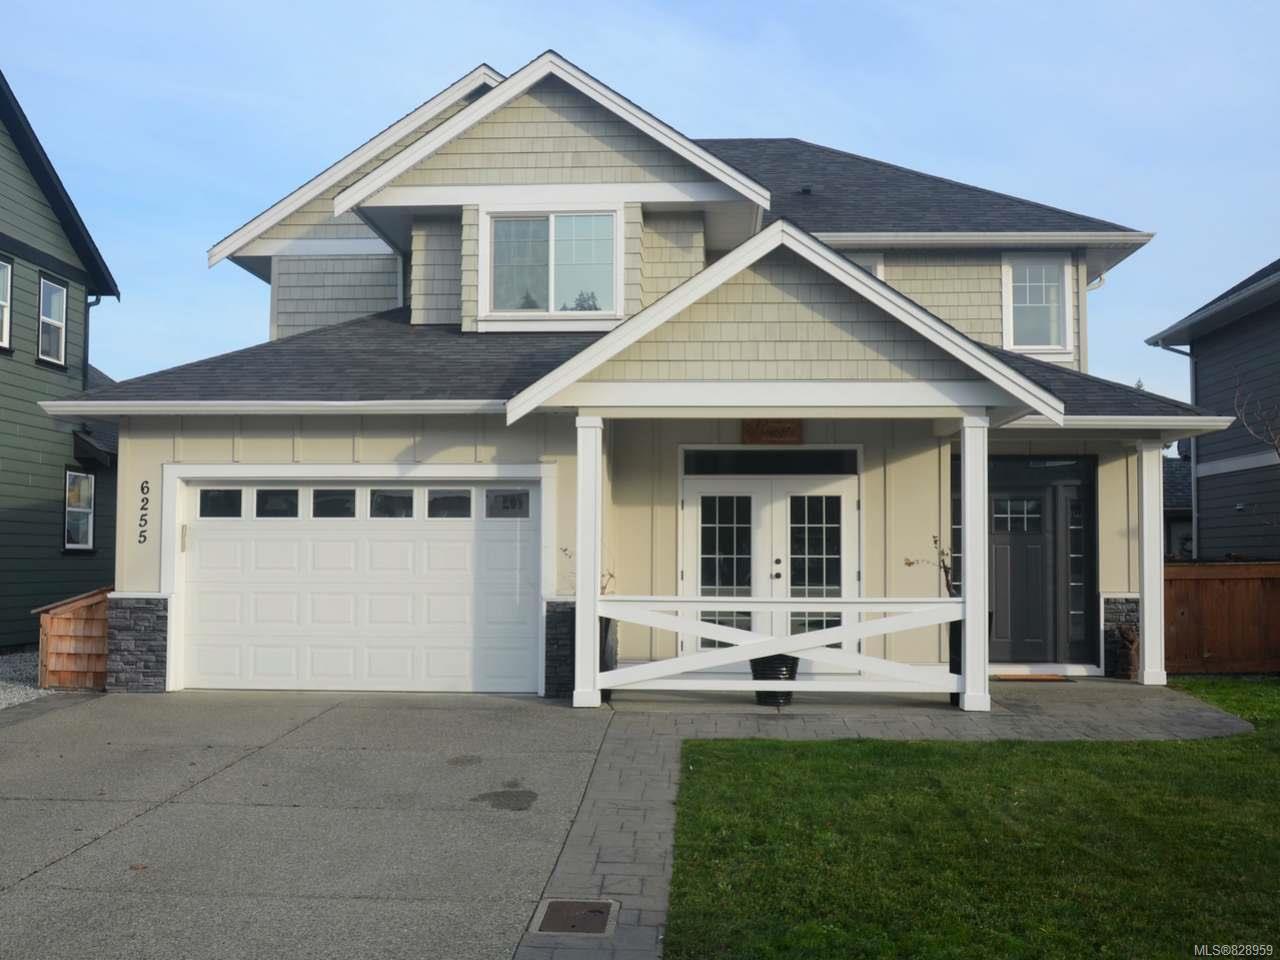 Main Photo: 6255 Averill Dr in DUNCAN: Du West Duncan House for sale (Duncan)  : MLS®# 828959